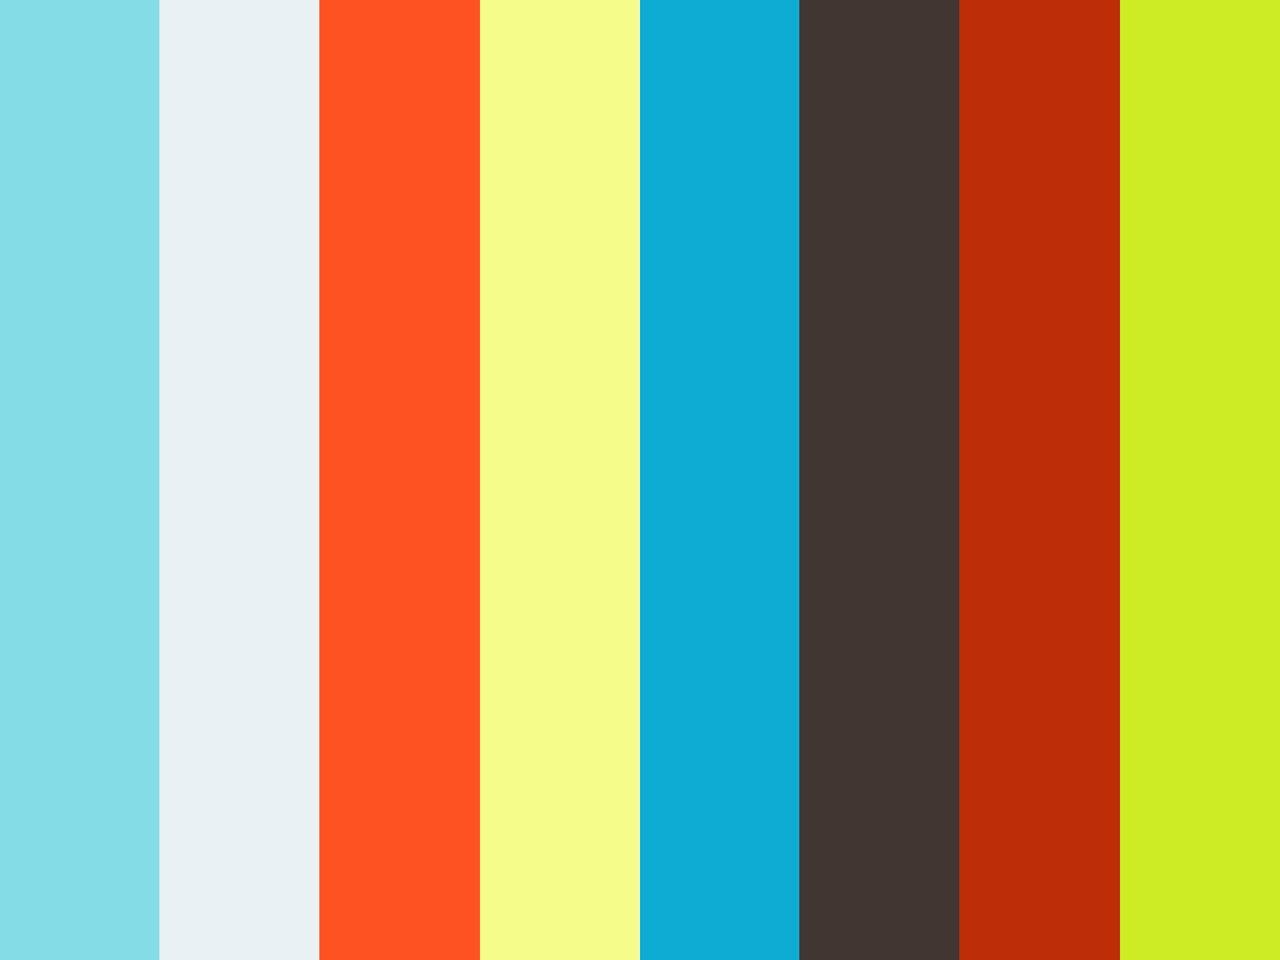 Arium: Omroep Gelderland